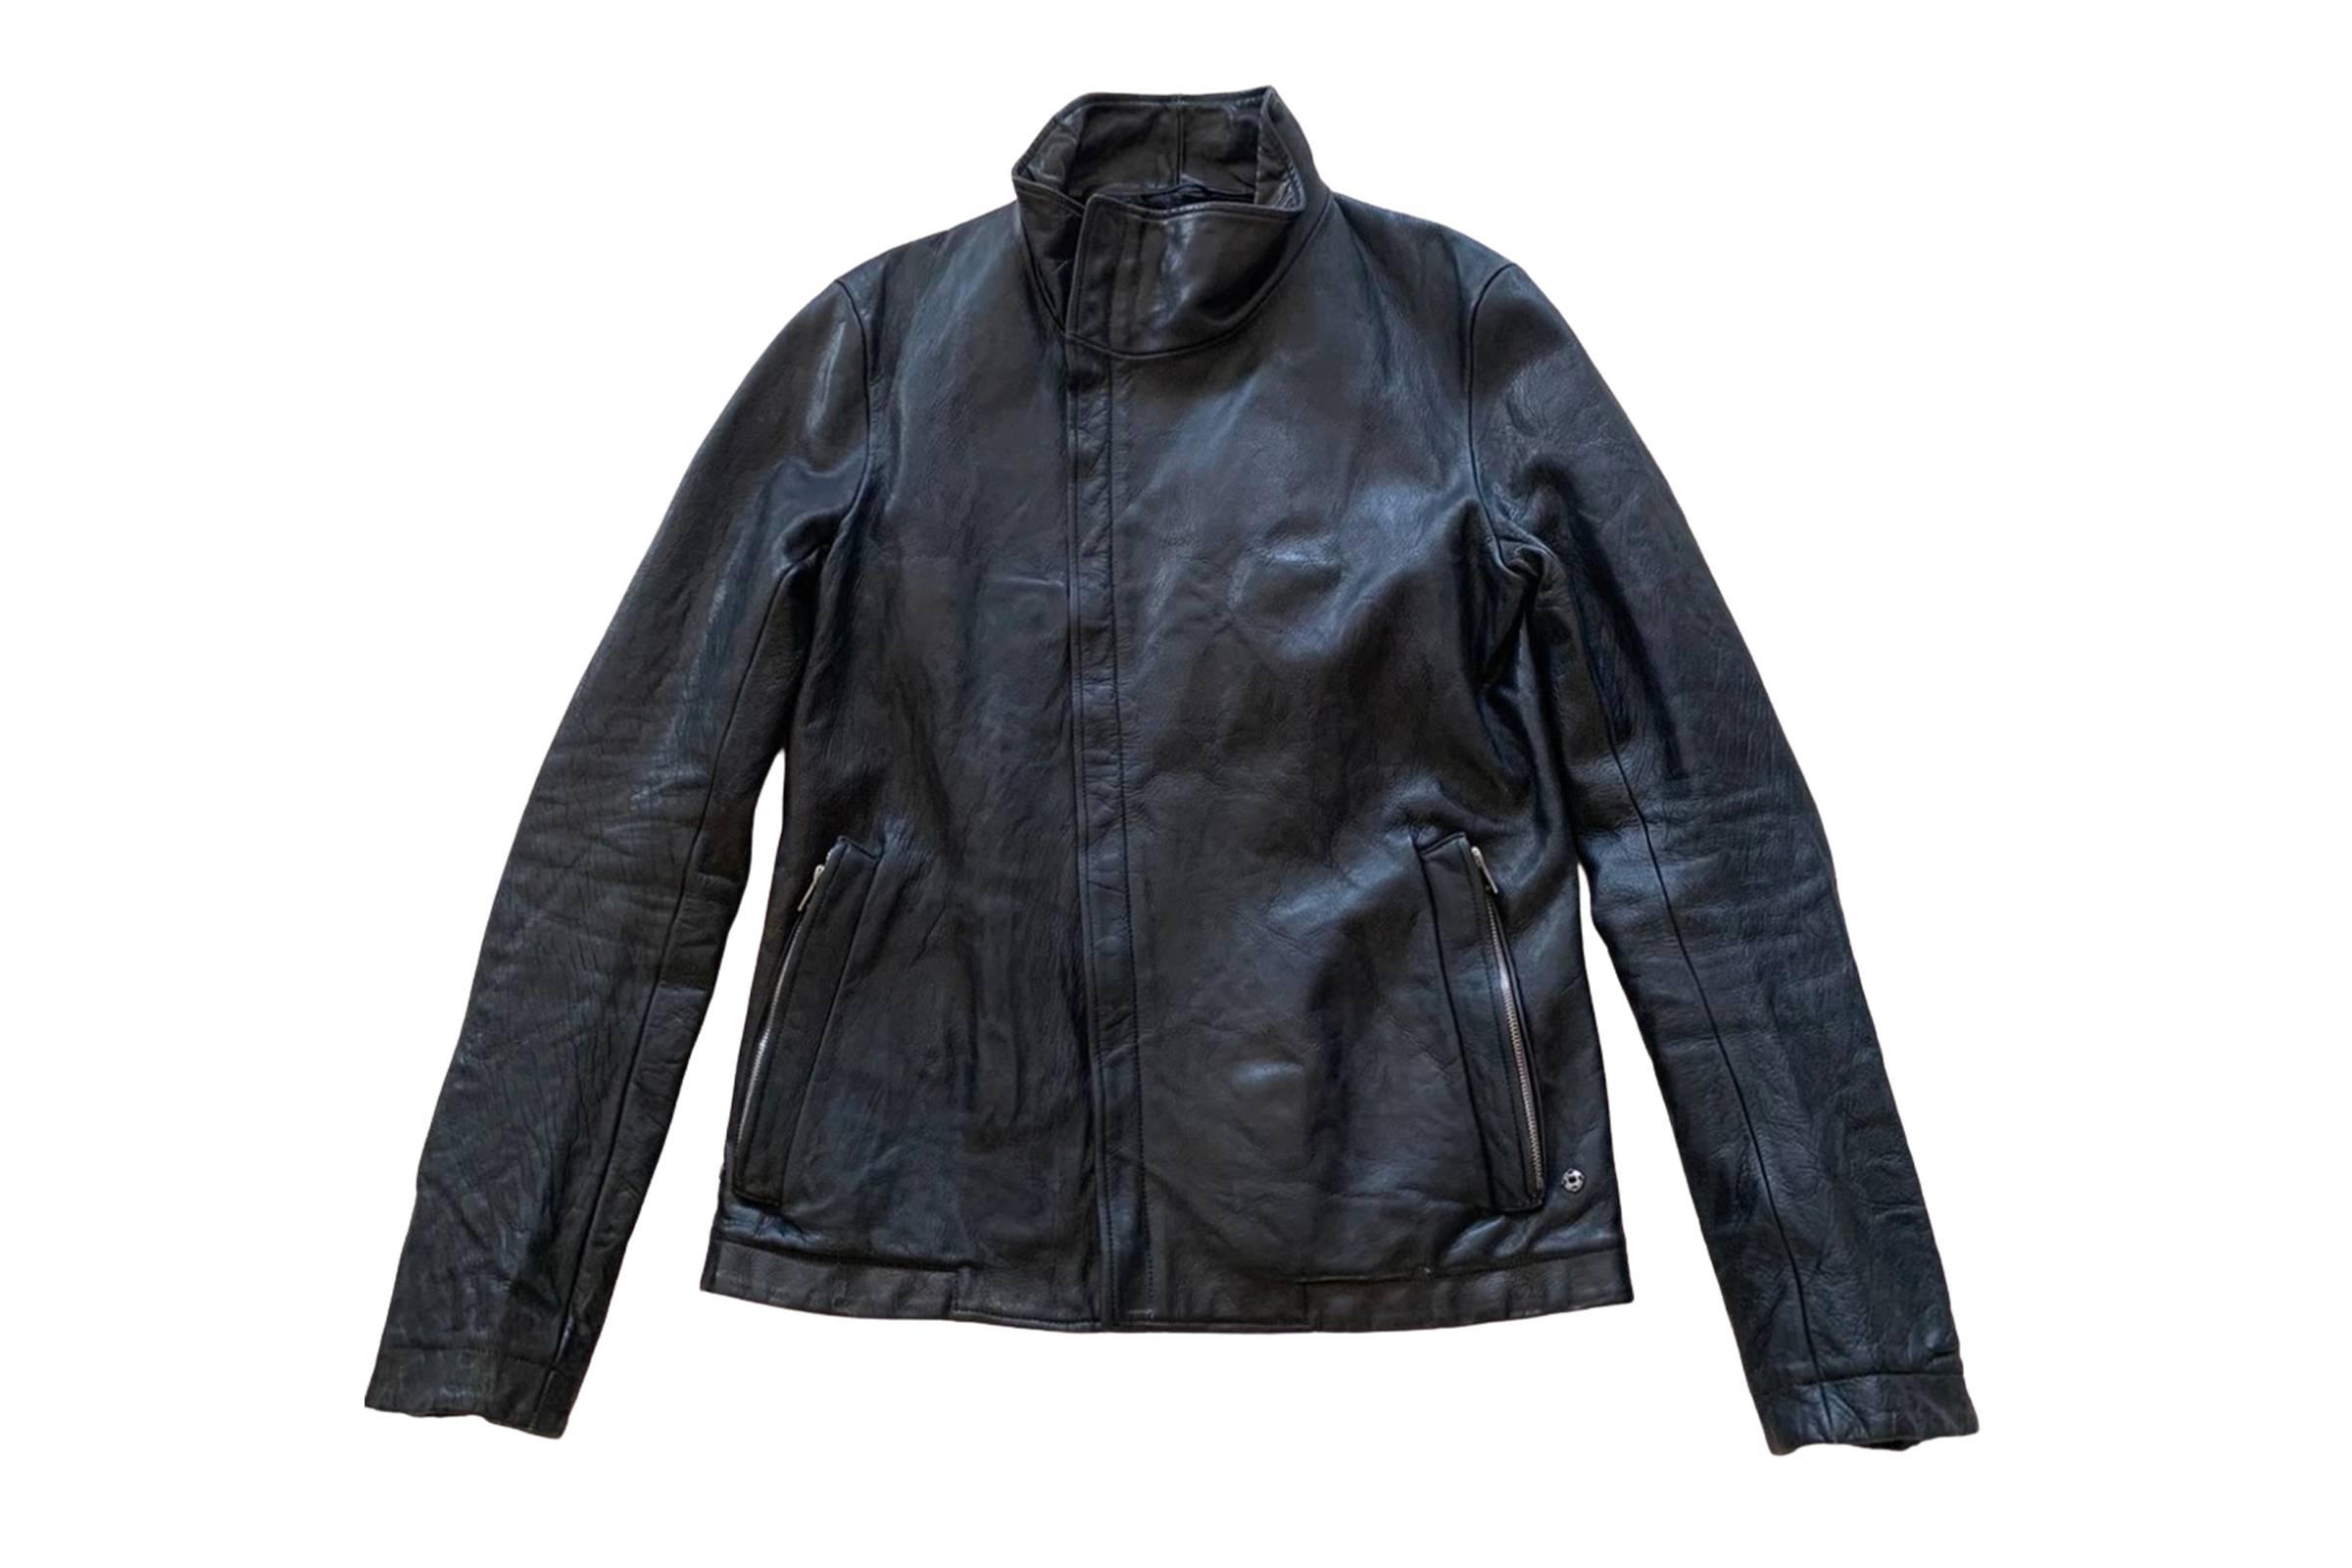 Carol Christian Poell High Neck Leather Jacket